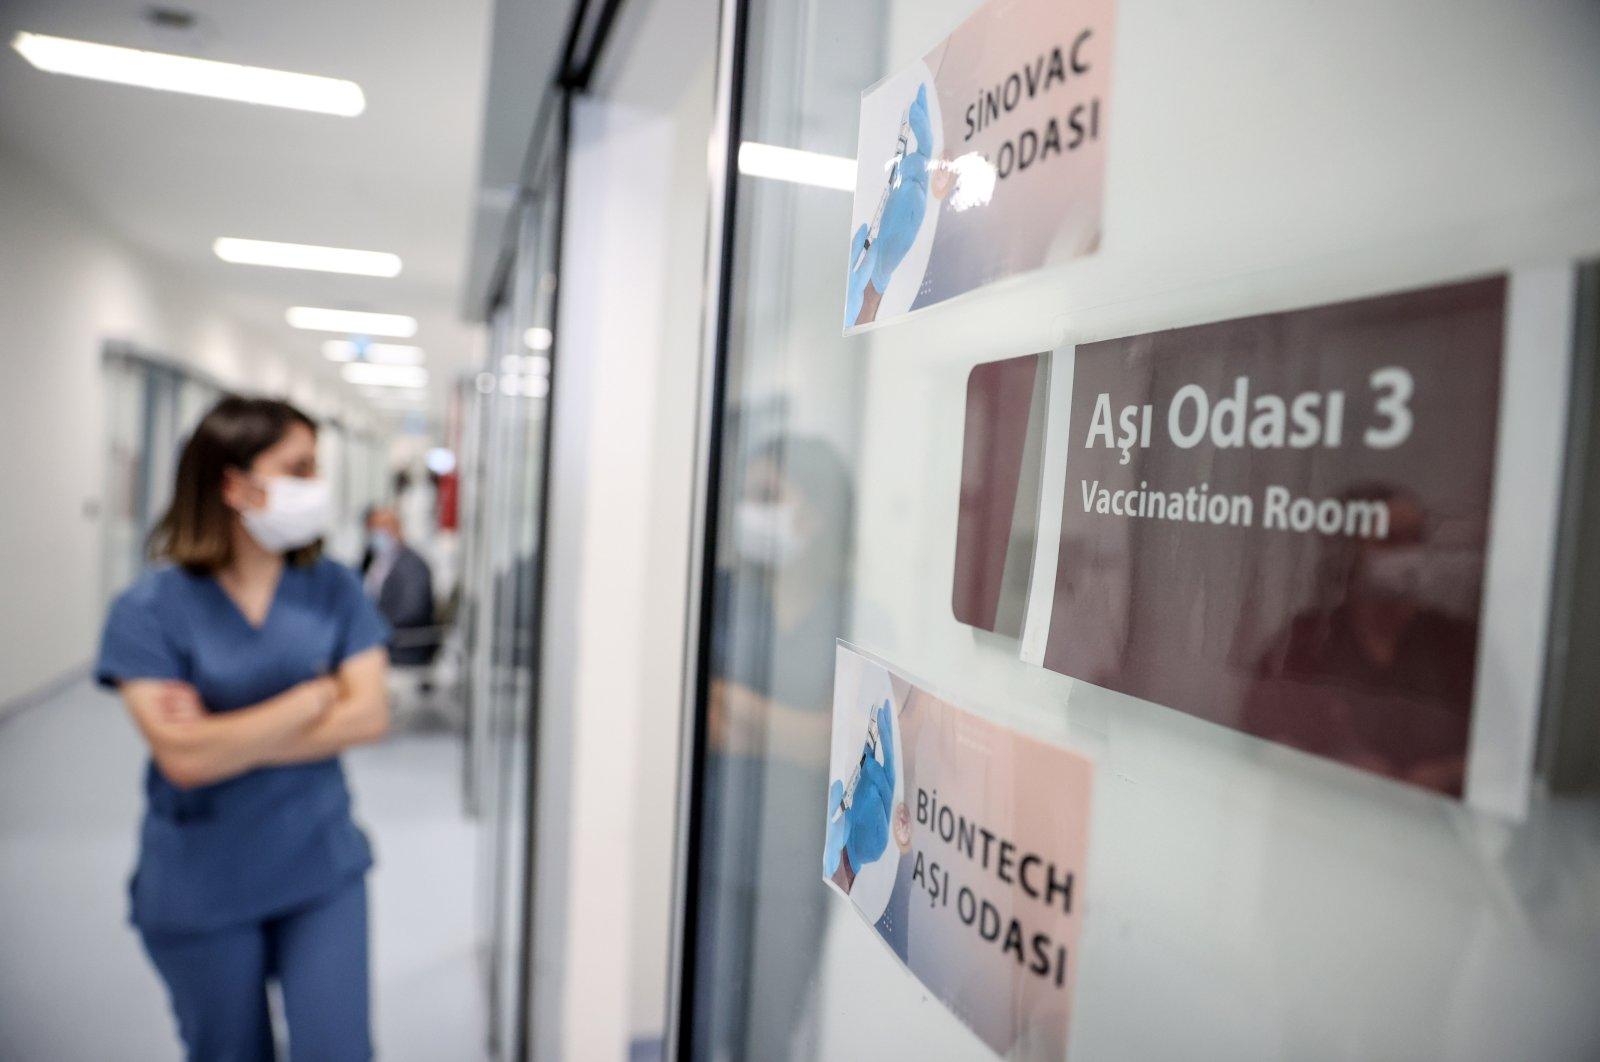 A nurse walks toward a vaccination room at the Prof. Dr. Feriha Öz Emergency Situation Hospital in Istanbul, Turkey, June 1, 2021. (AA Photo)